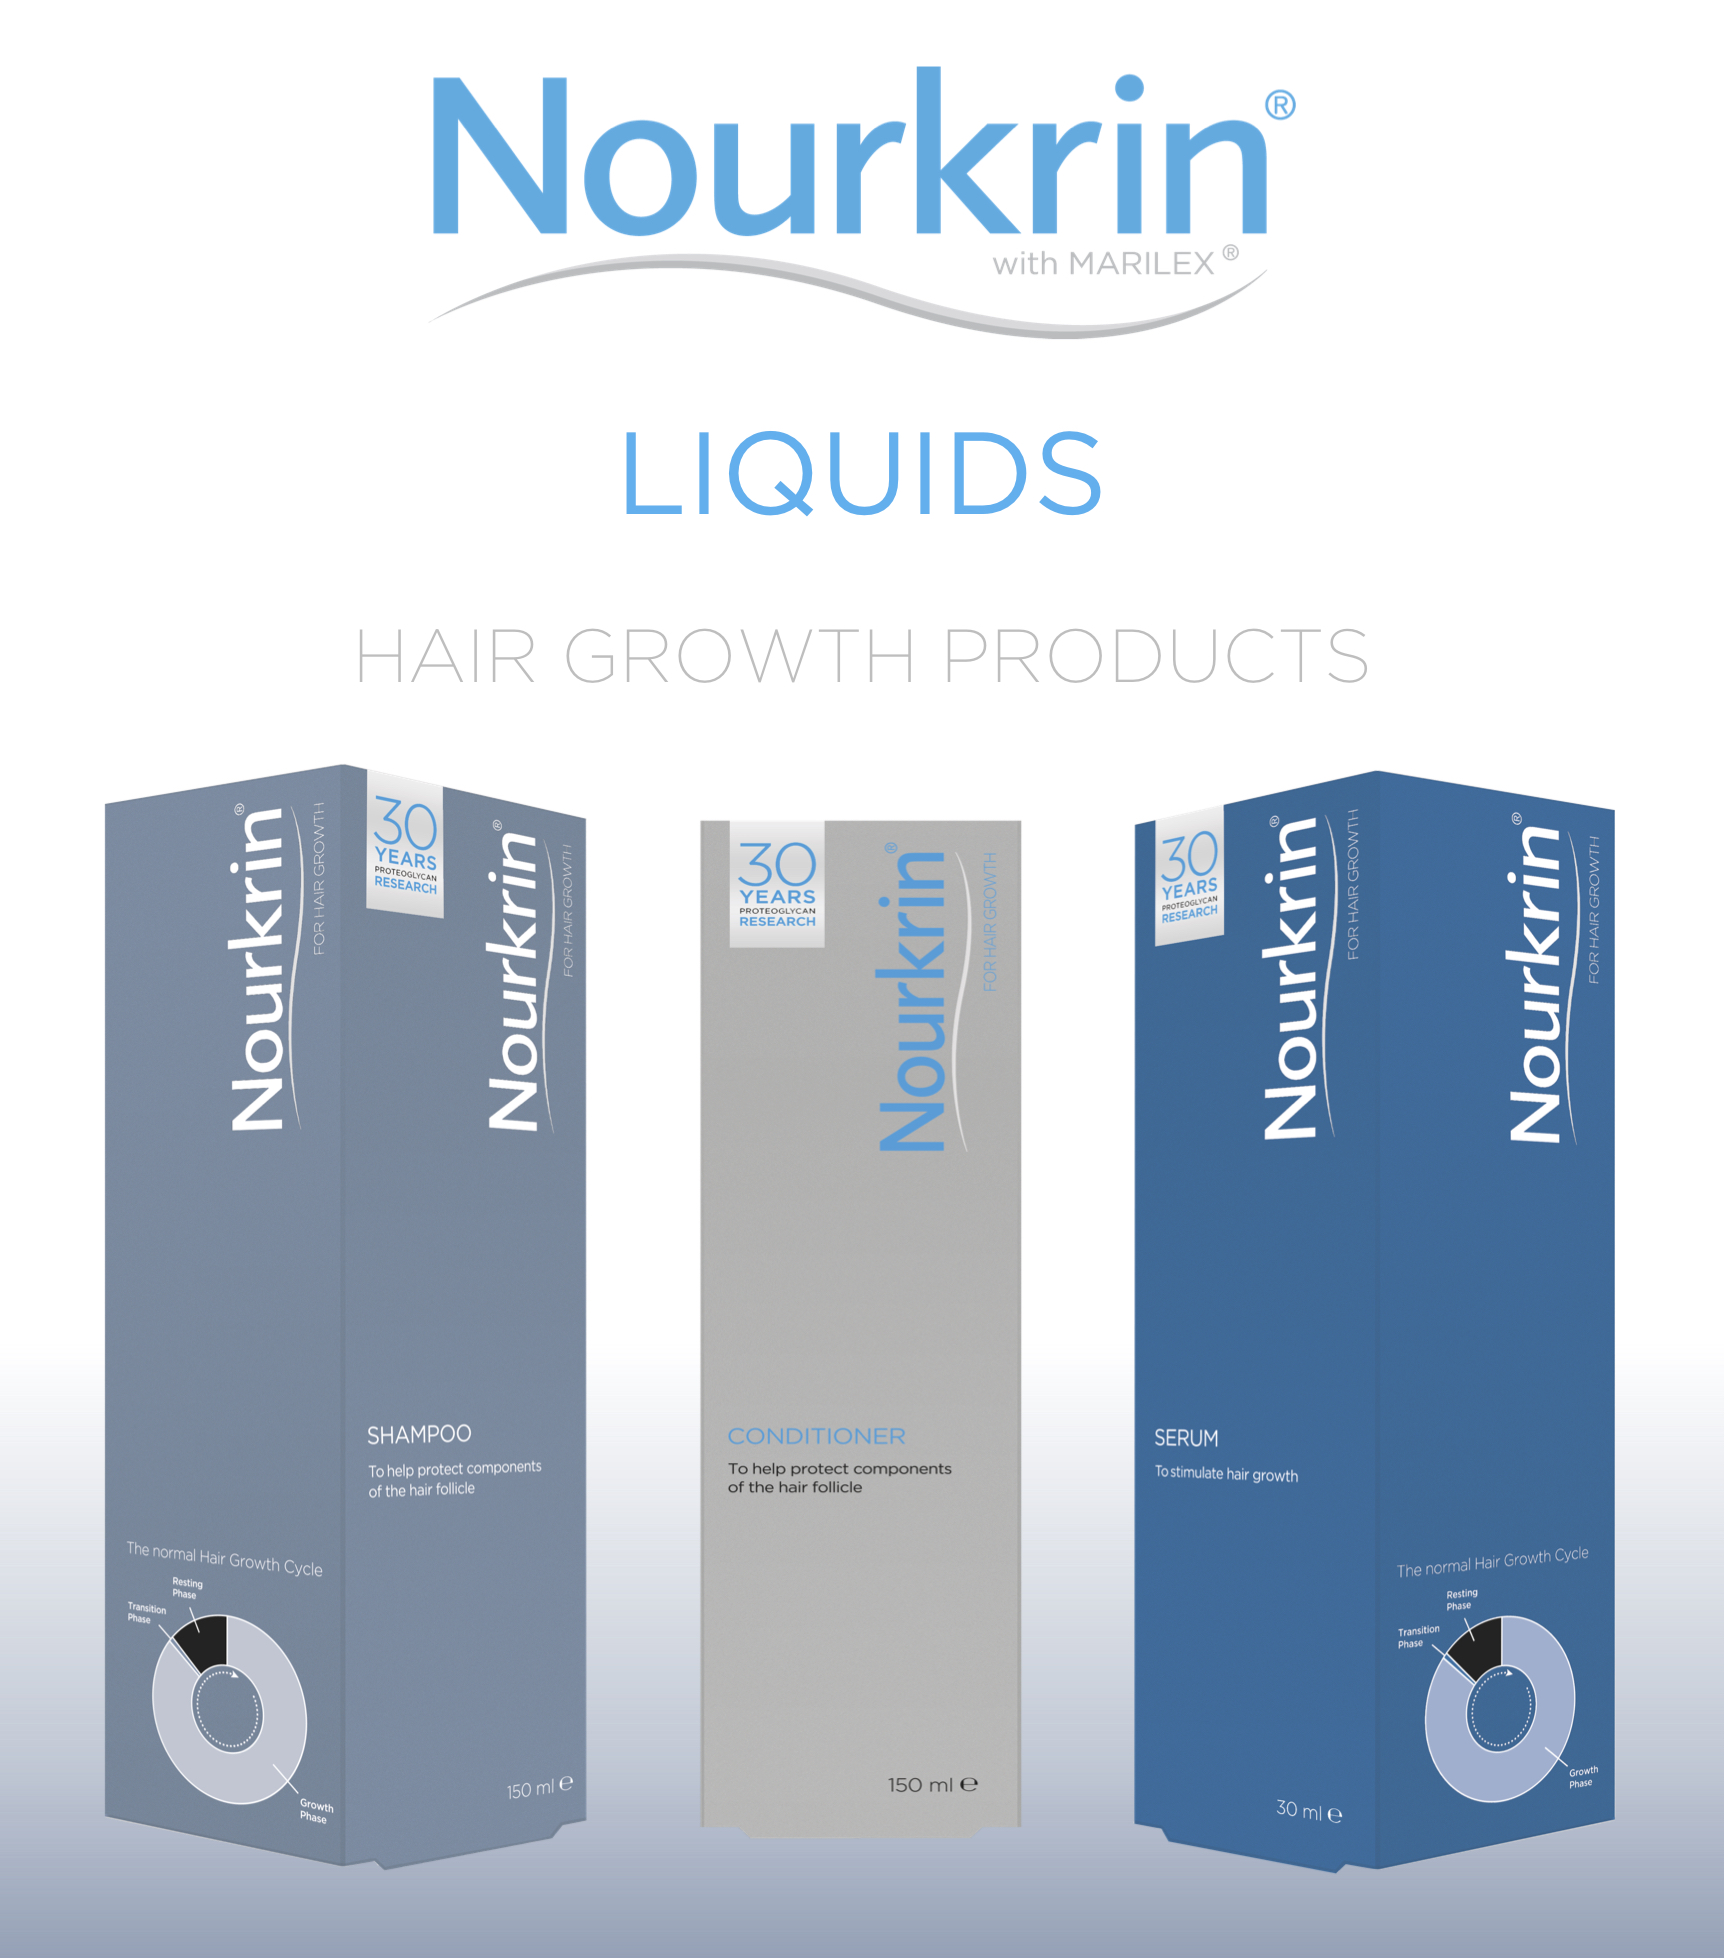 Nourkrin Liquids